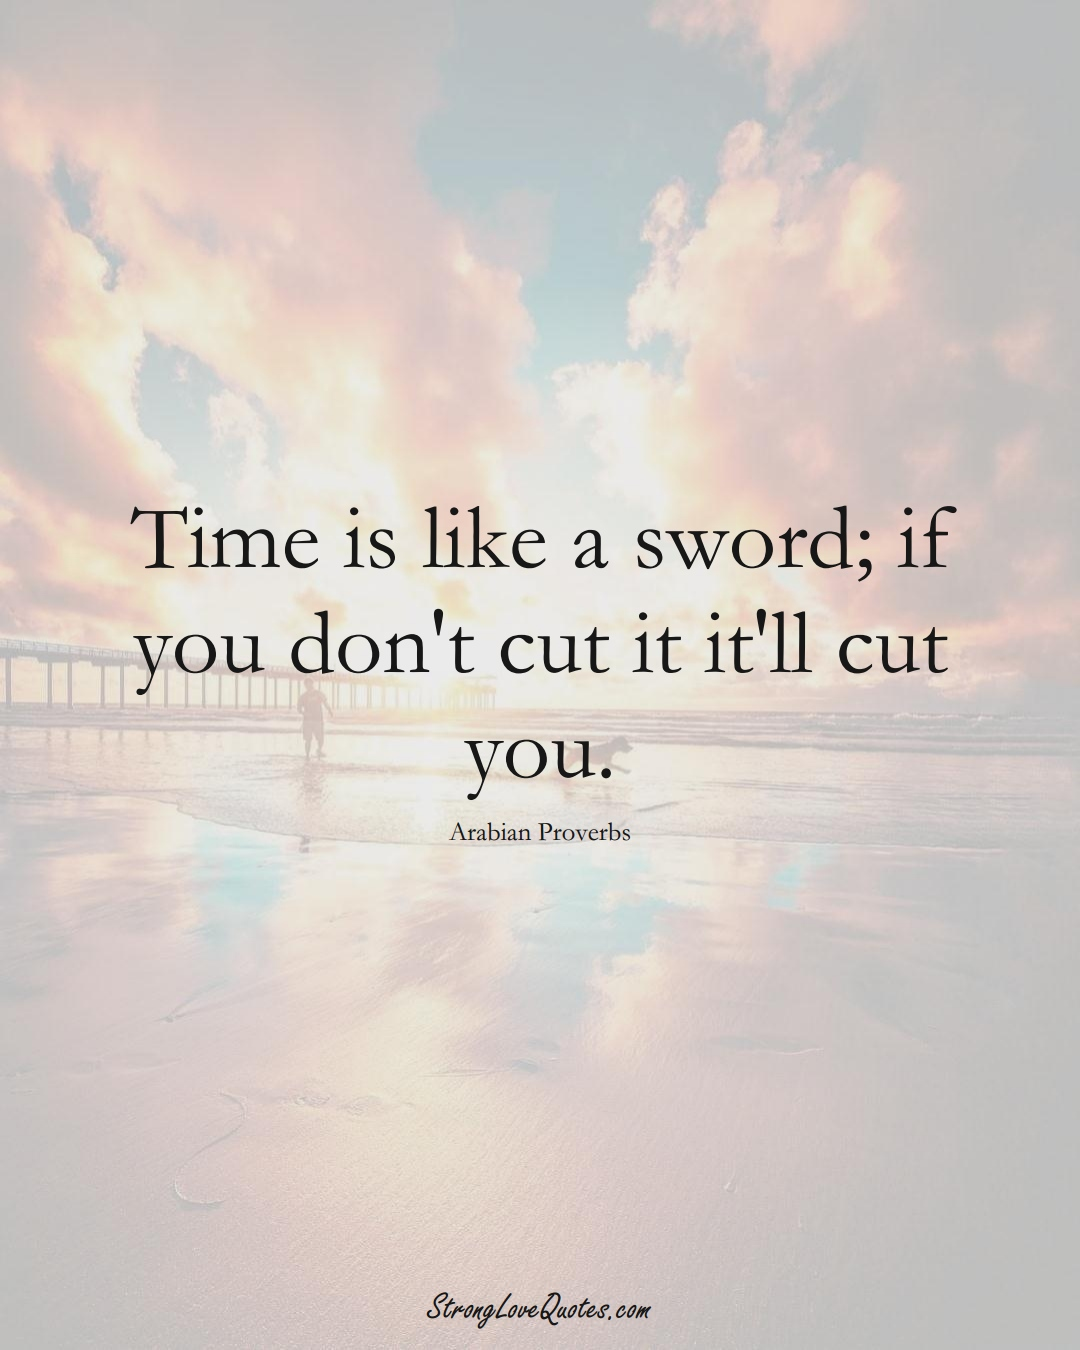 Time is like a sword; if you don't cut it it'll cut you. (Arabian Sayings);  #aVarietyofCulturesSayings